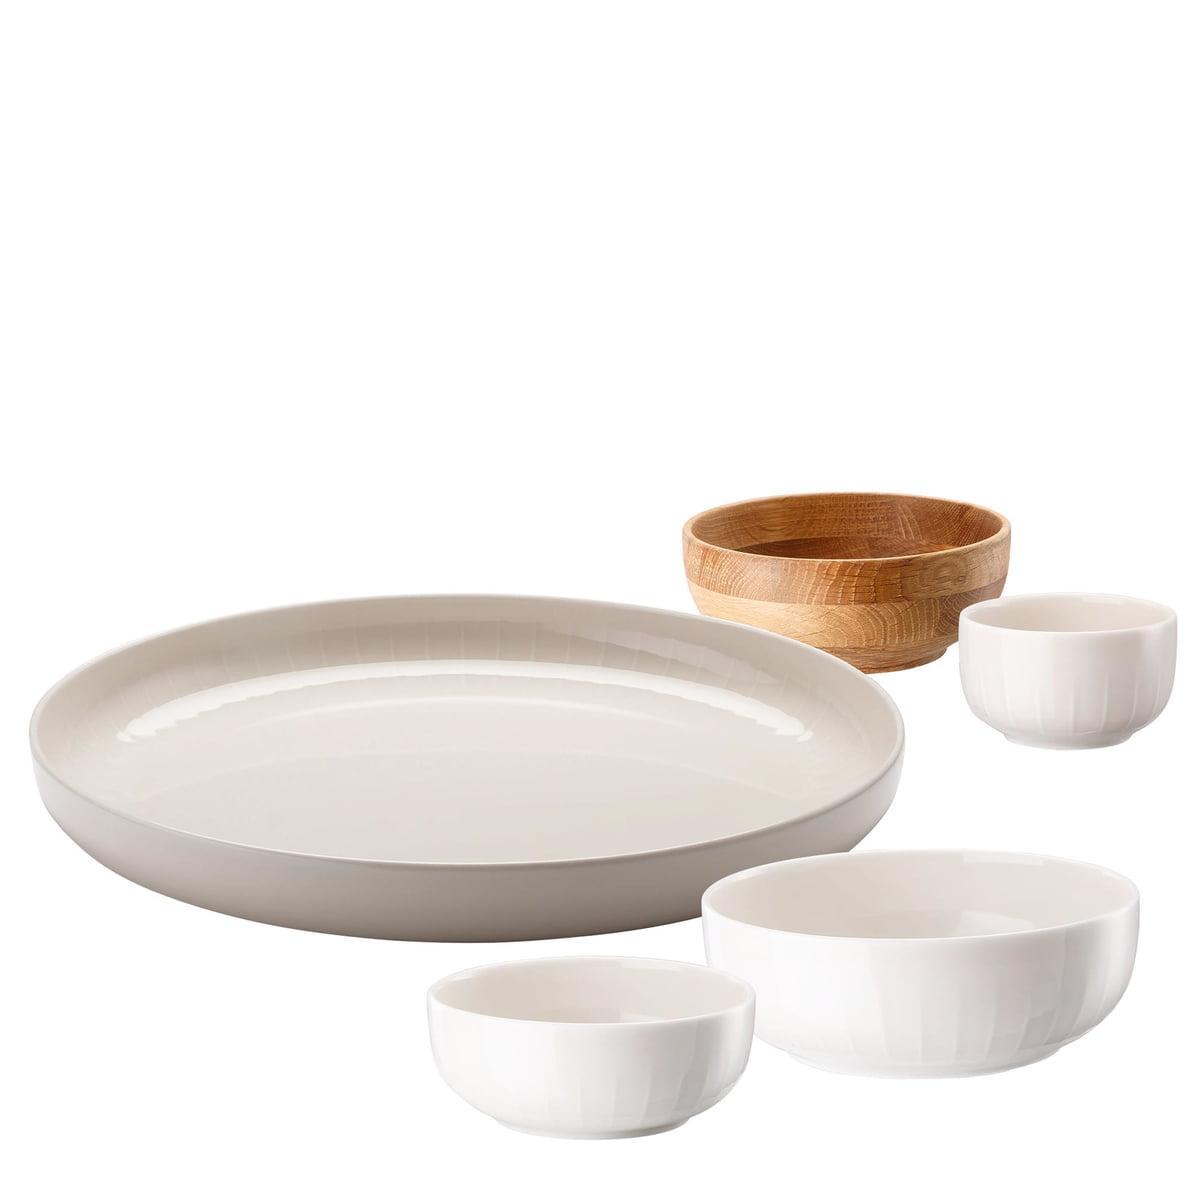 joyn dinnerware set ros by arzberg connox. Black Bedroom Furniture Sets. Home Design Ideas